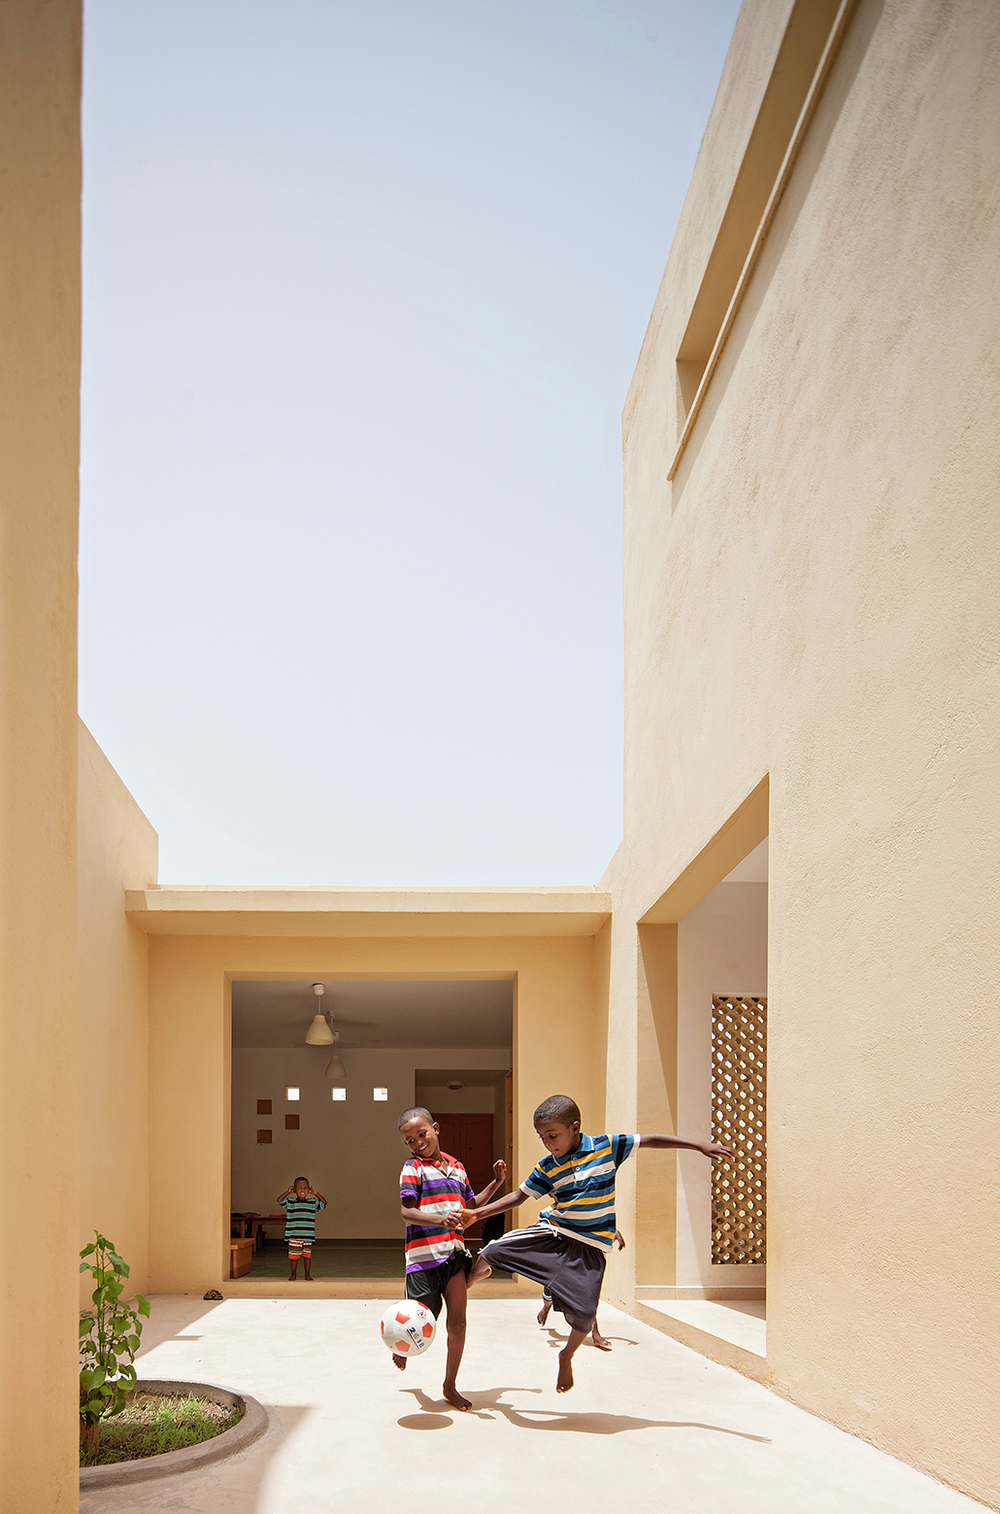 SOS_Village_Djibouti_-_Houses_(14).jpg